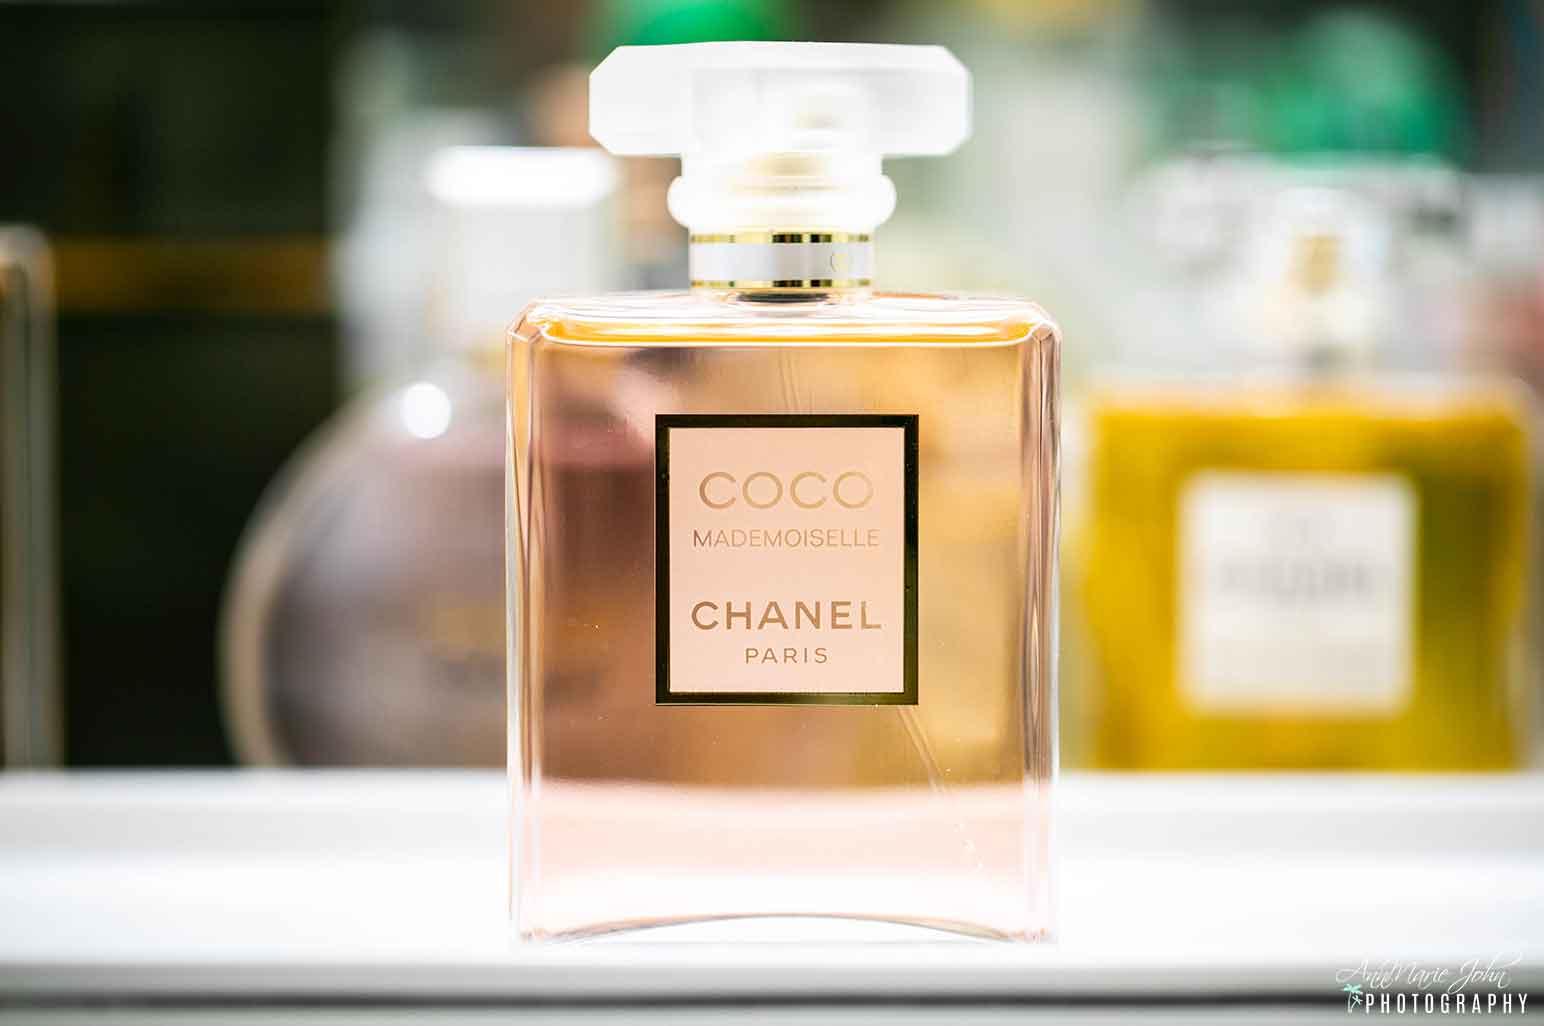 Top 5 CHANEL Perfume Fragrances